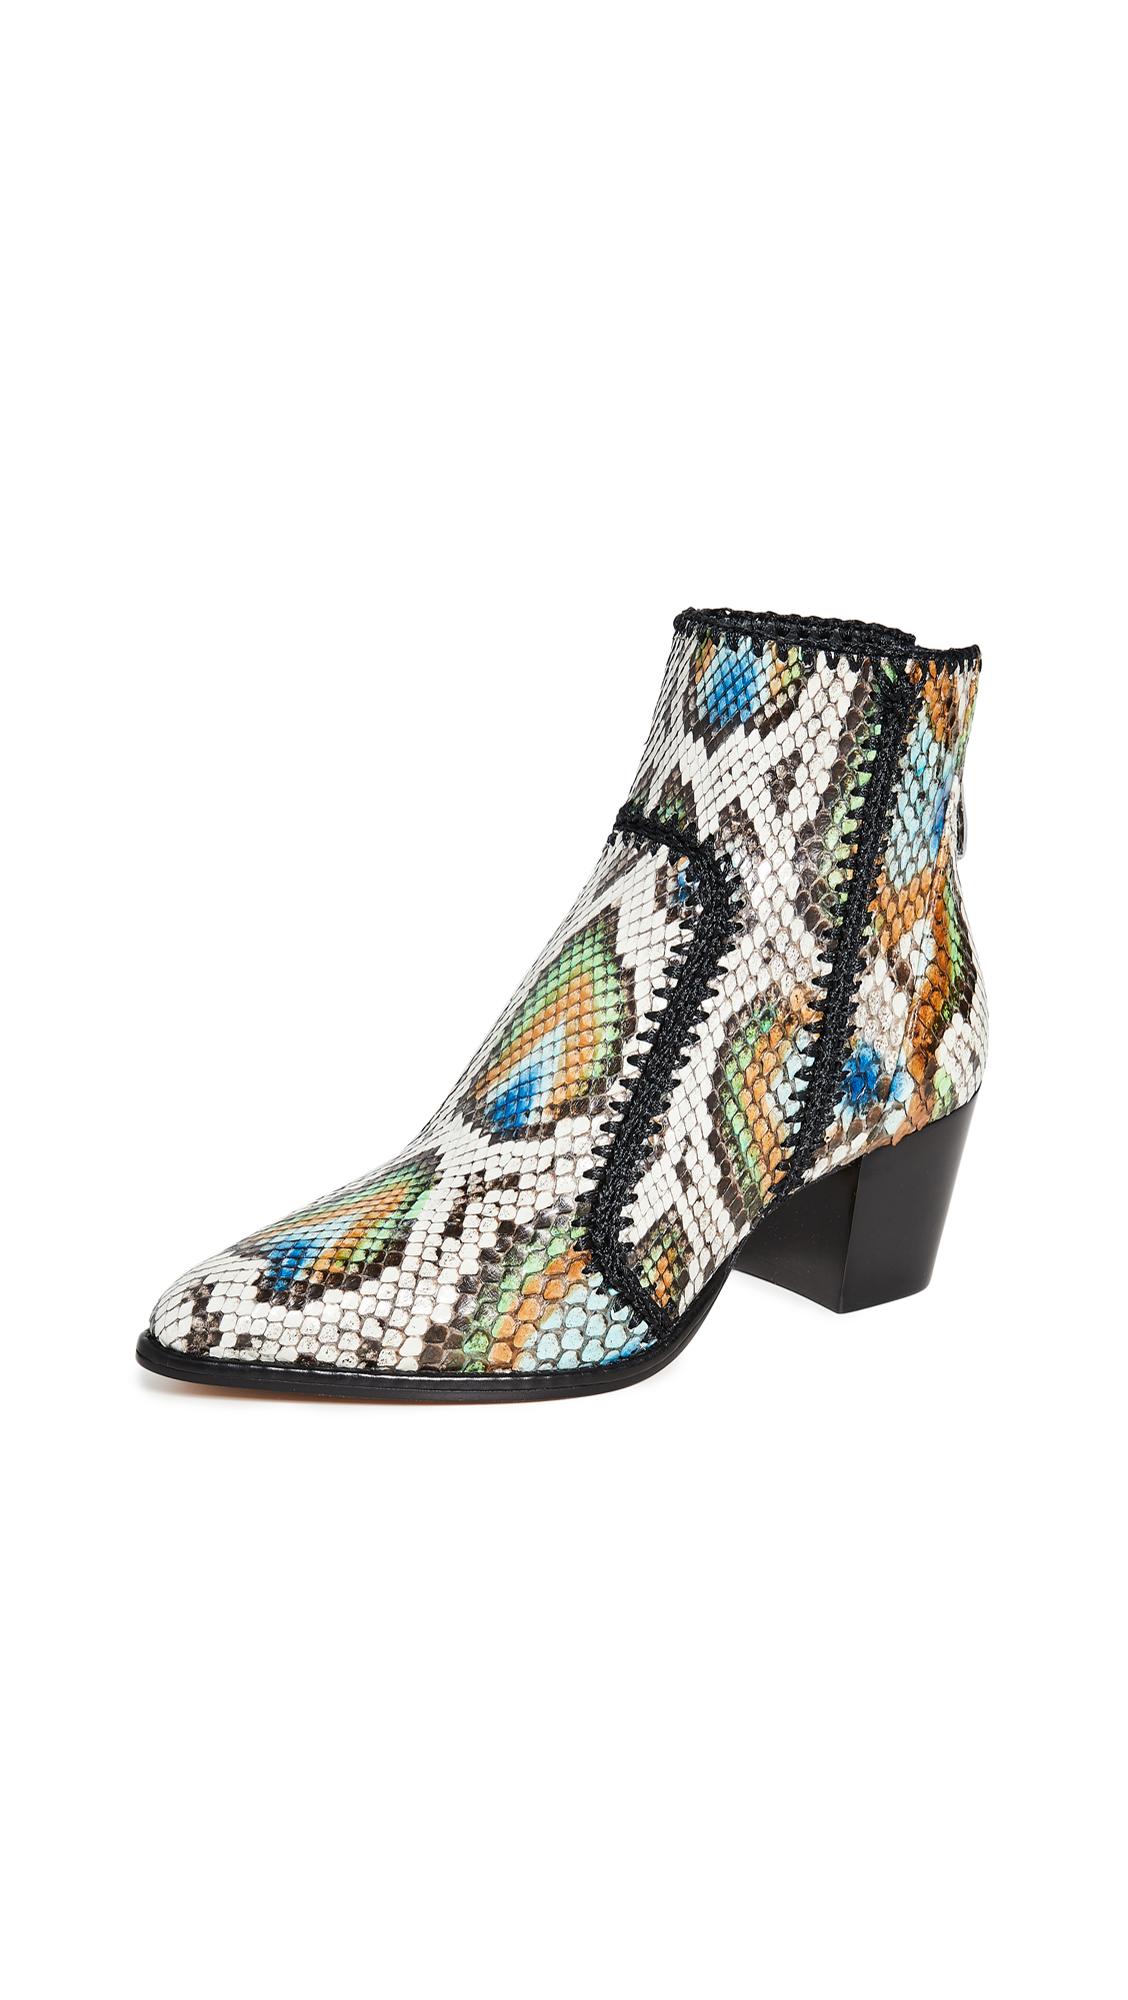 Alexandre Birman Benta Python Boots - Multi